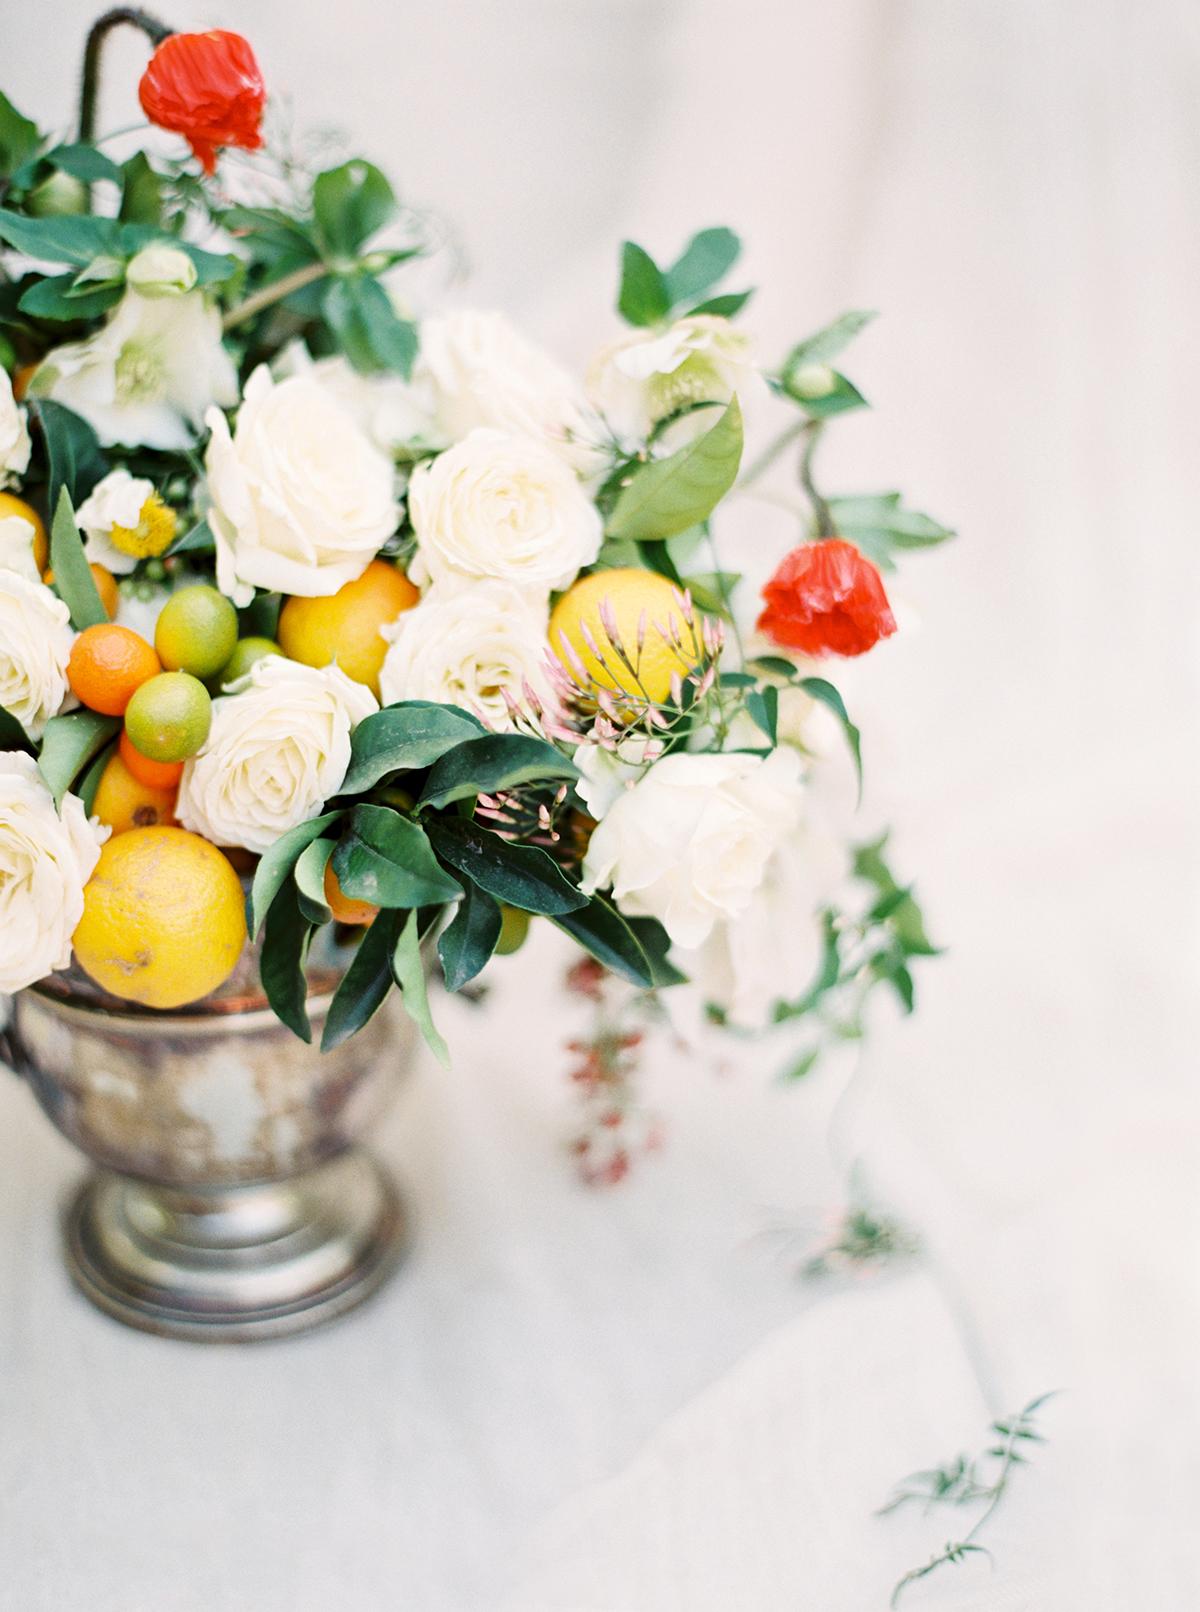 Rose, Poppy & Citrus Floral Arrangement by Fleuropean. Photography by Ashley Ludaescher